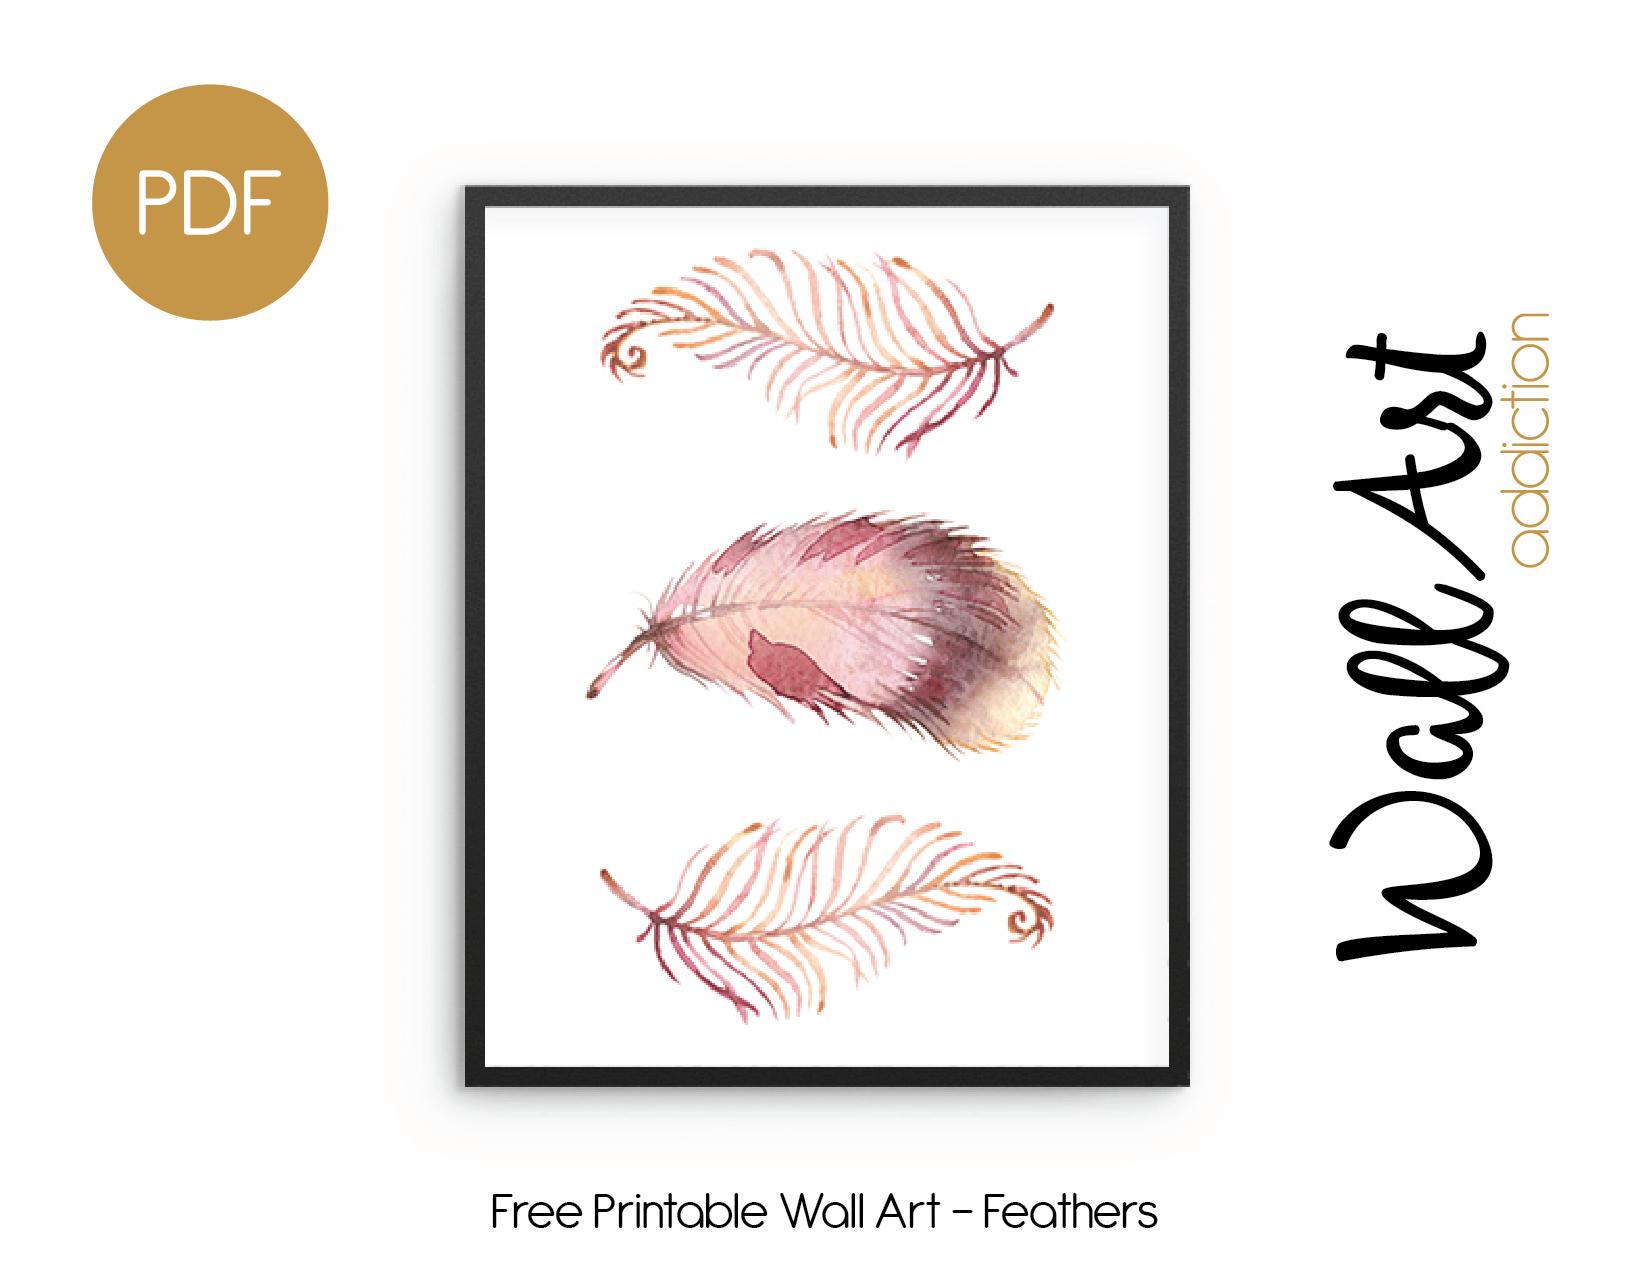 Wall Art Addiction | Only Free Printable Wall Arts - Free Printable Wall Posters